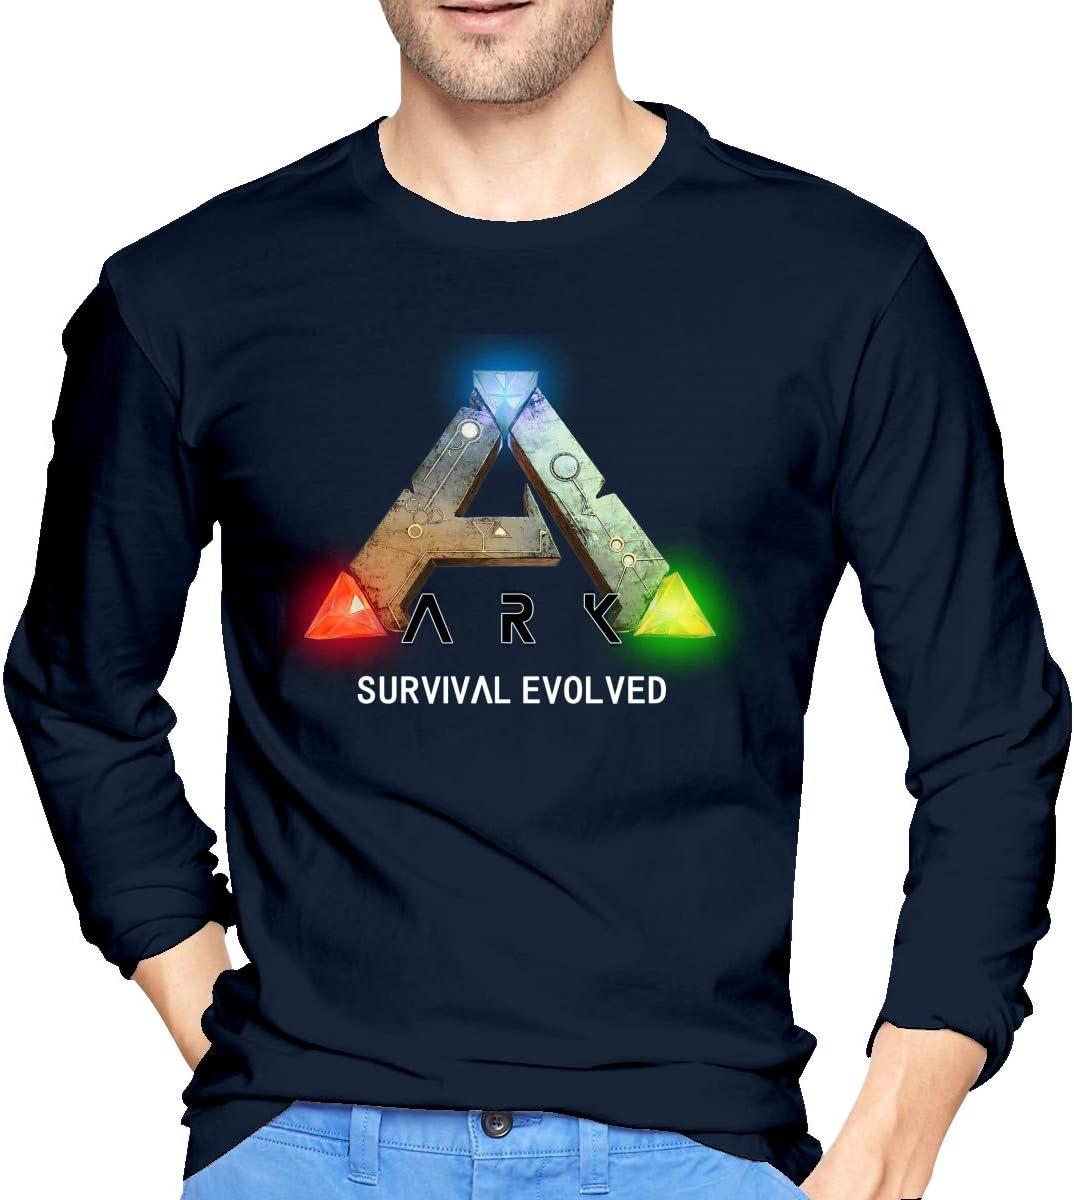 Patrick R Garrett Ark-Survival-Evolved Camisetas de Manga Larga Estampadas para Hombre Camiseta con Estilo Informal para Ropa de Calle 2